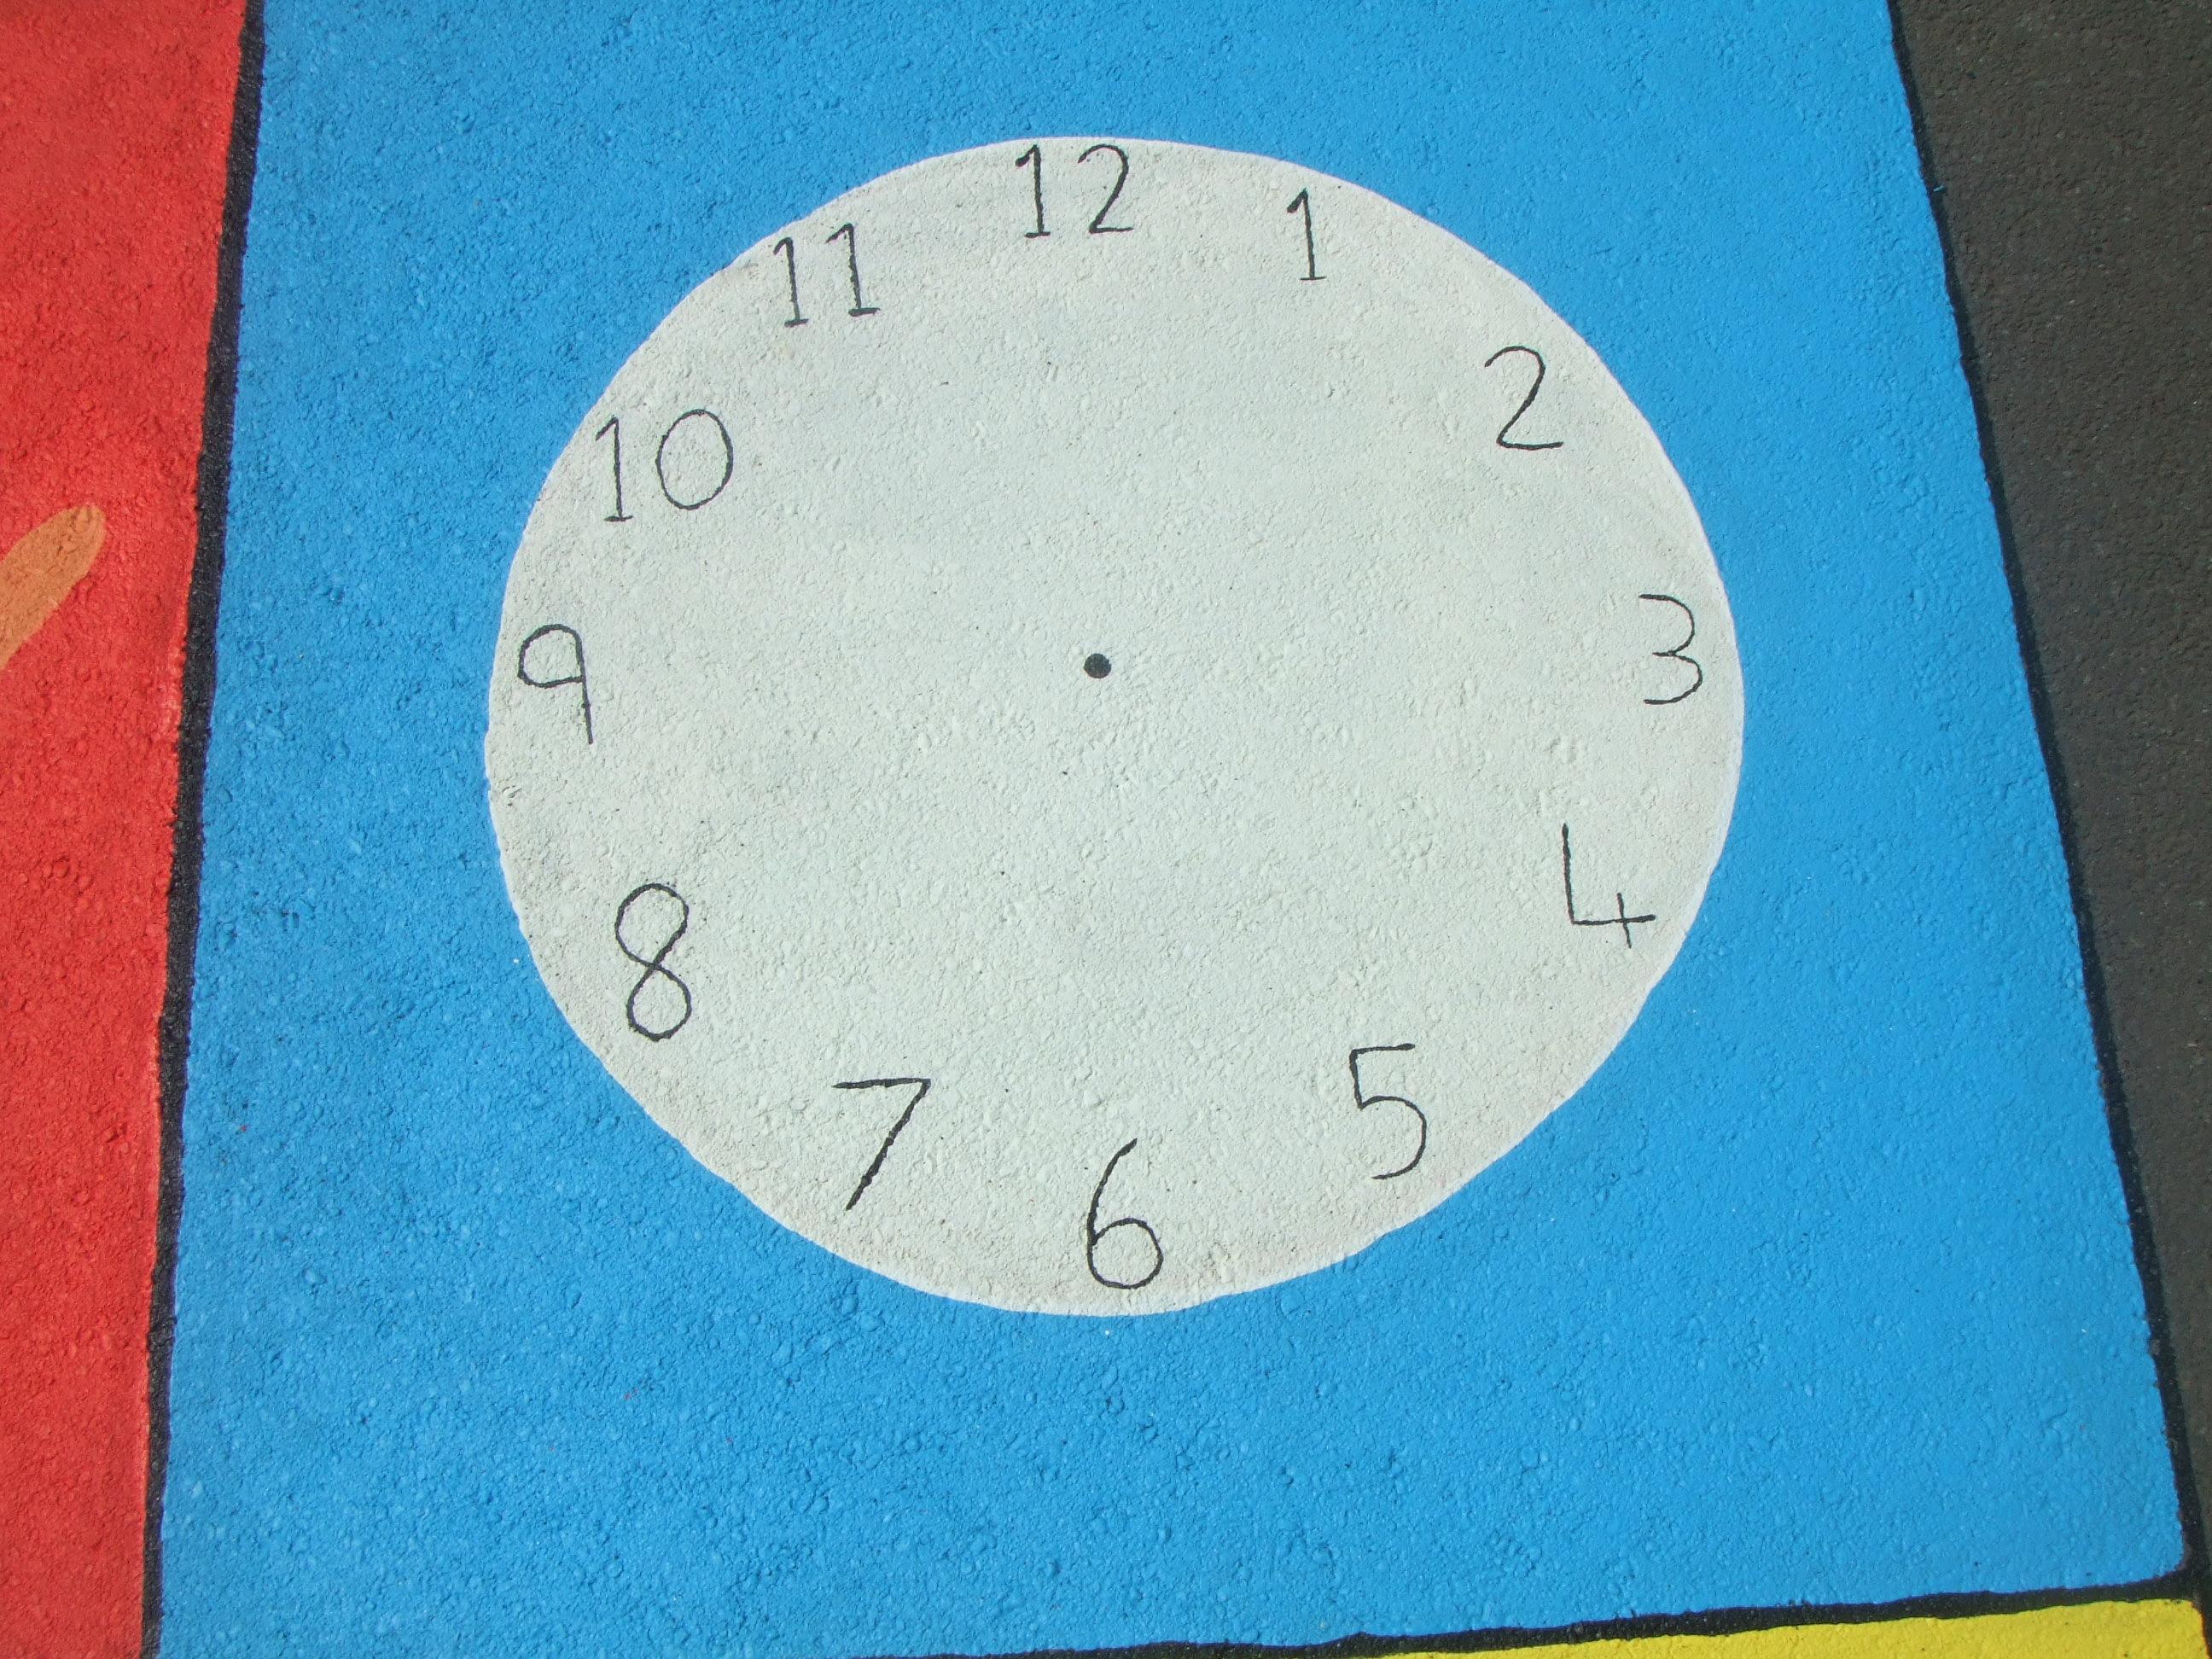 25. THE CLOCK